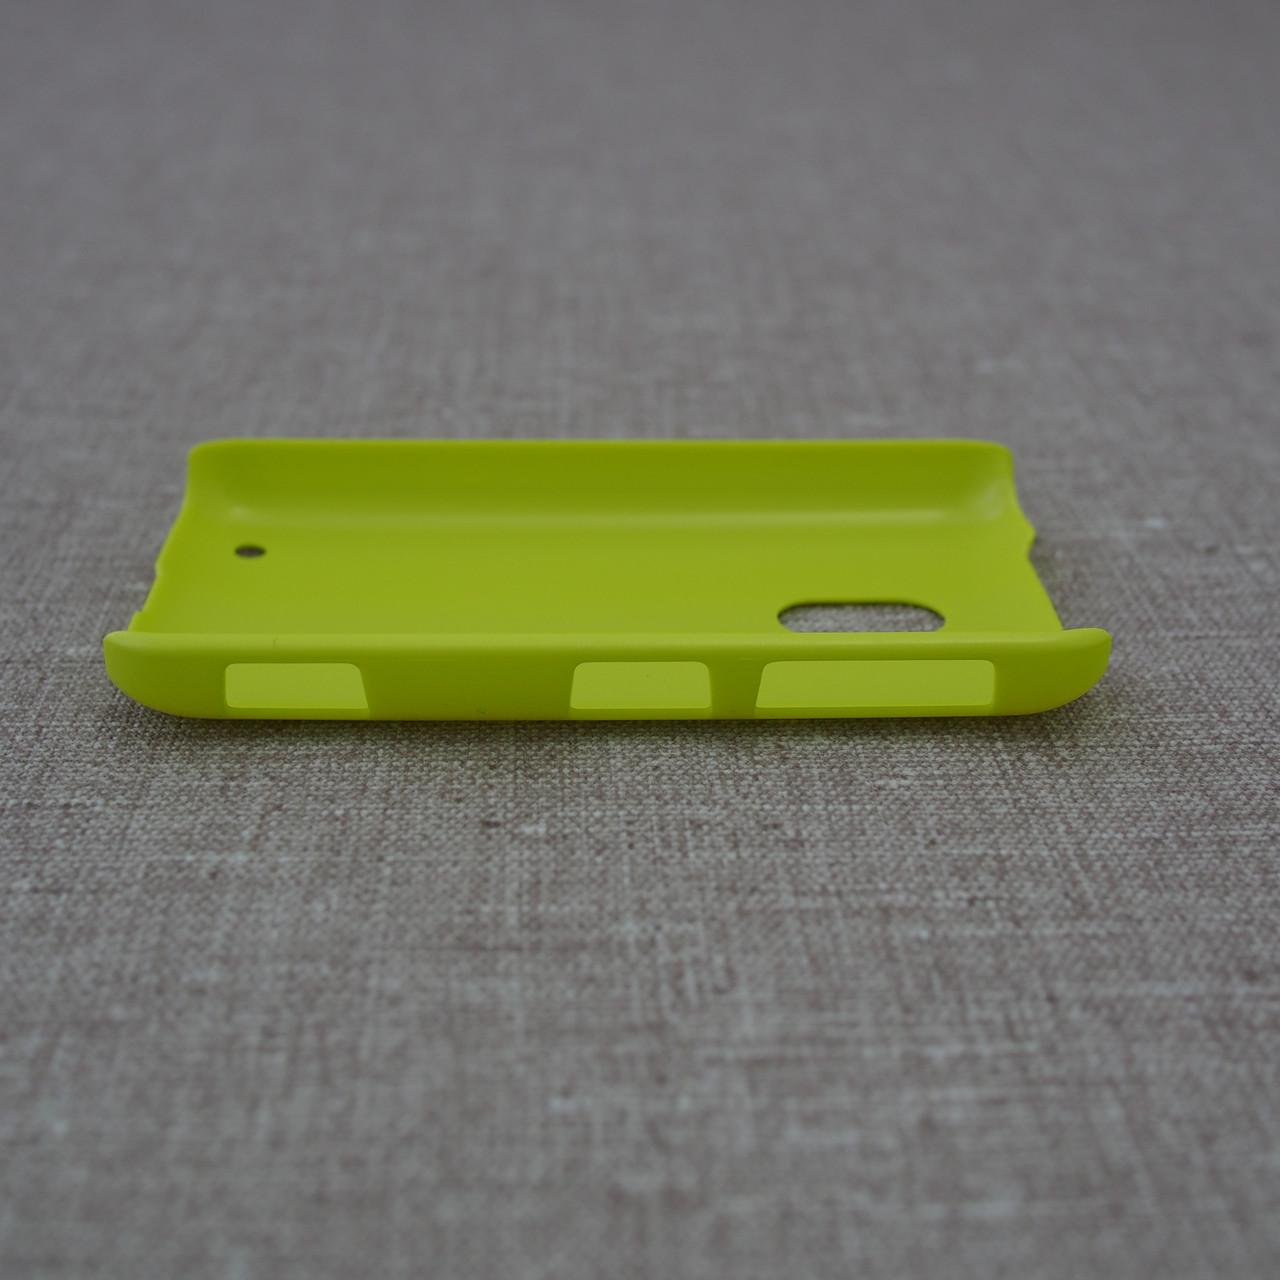 Накладка ROCK NakedShell Nokia Lumia 620 yellow Для телефона